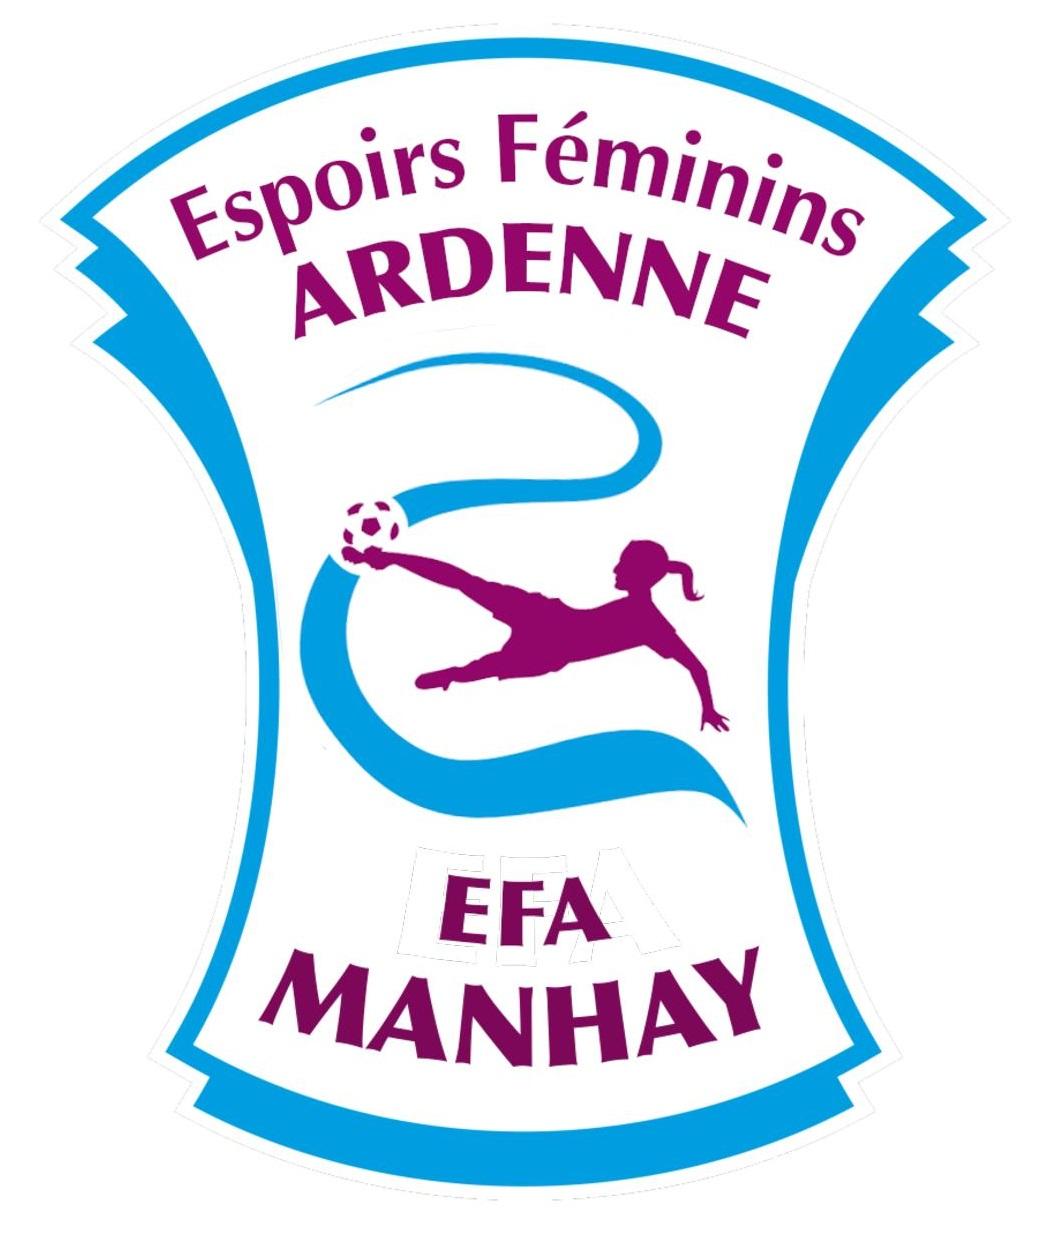 1 - EFA.Manhay